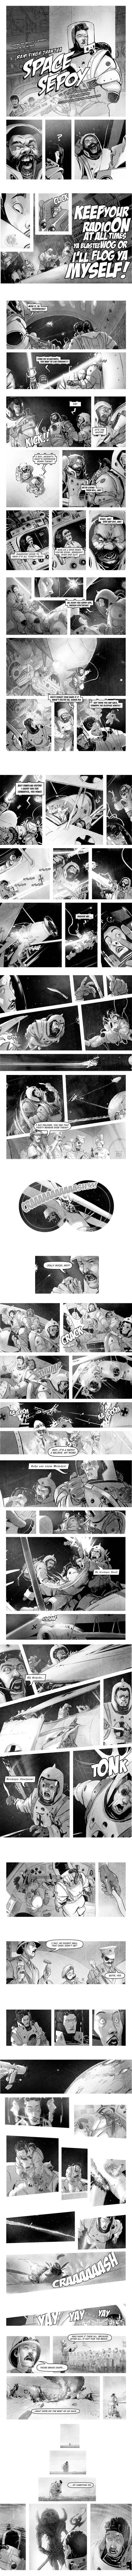 Ram Singh Jhanjua – SPACE SEPOY